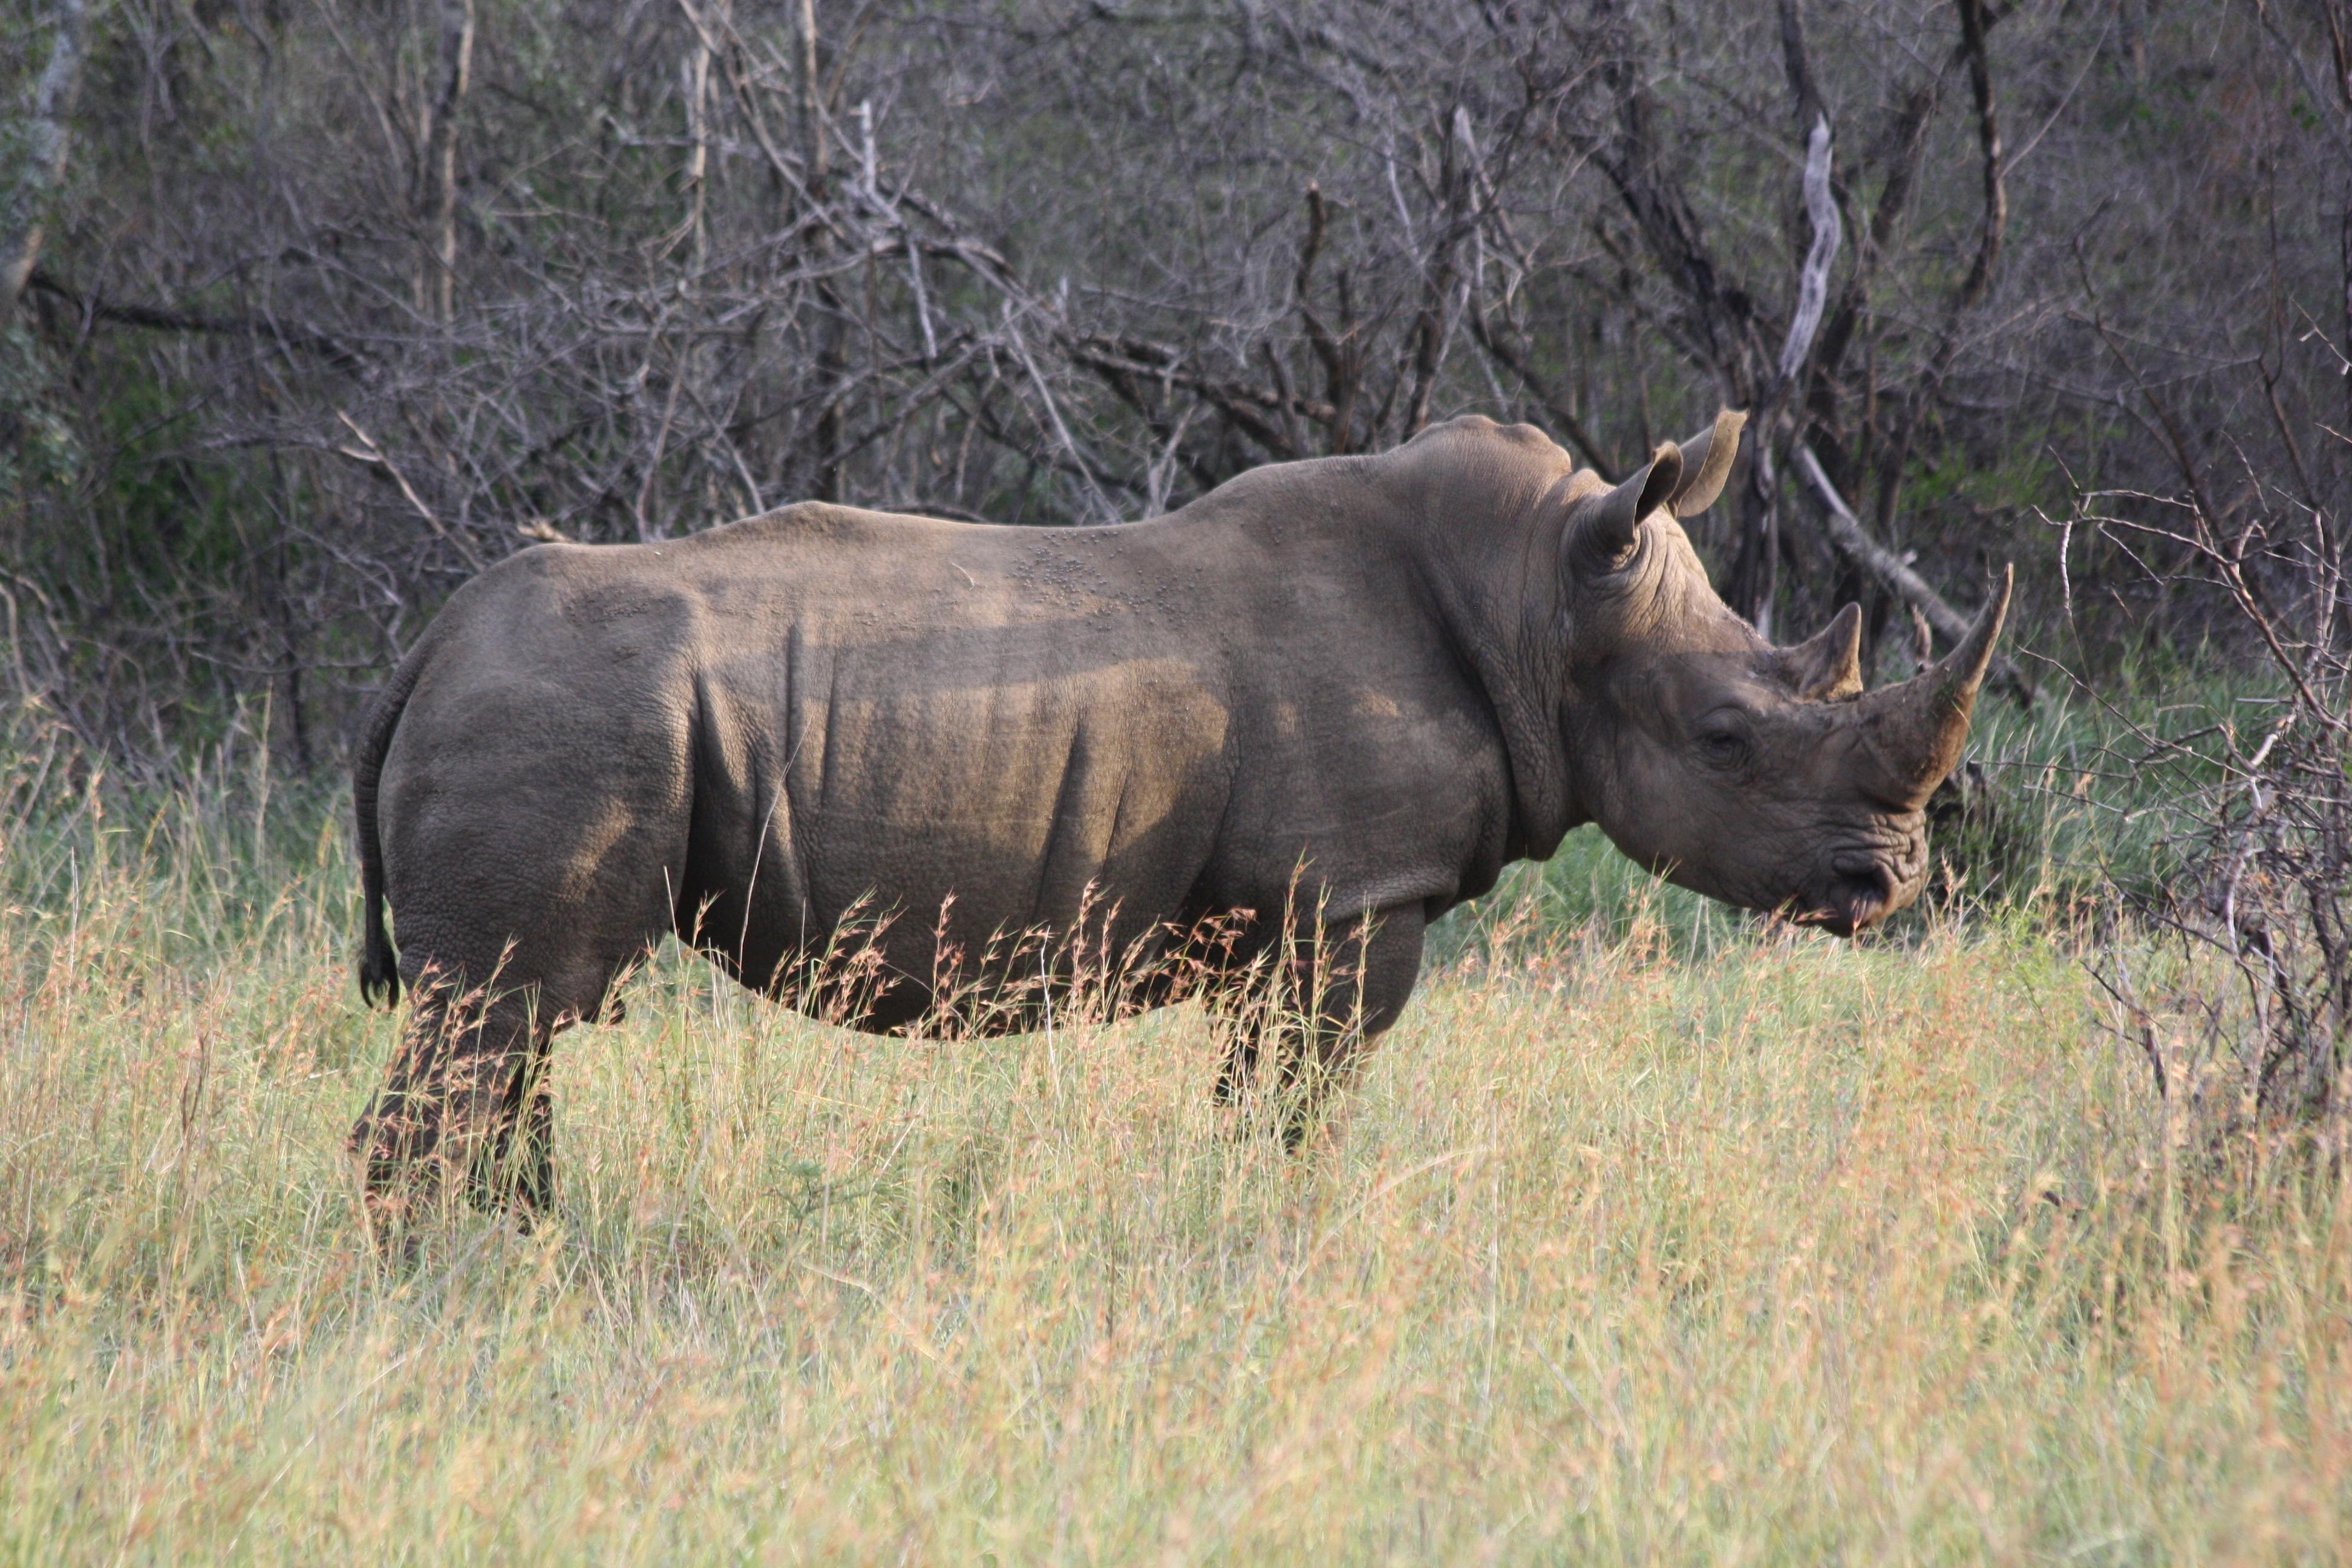 Western black rhinoceros poaching